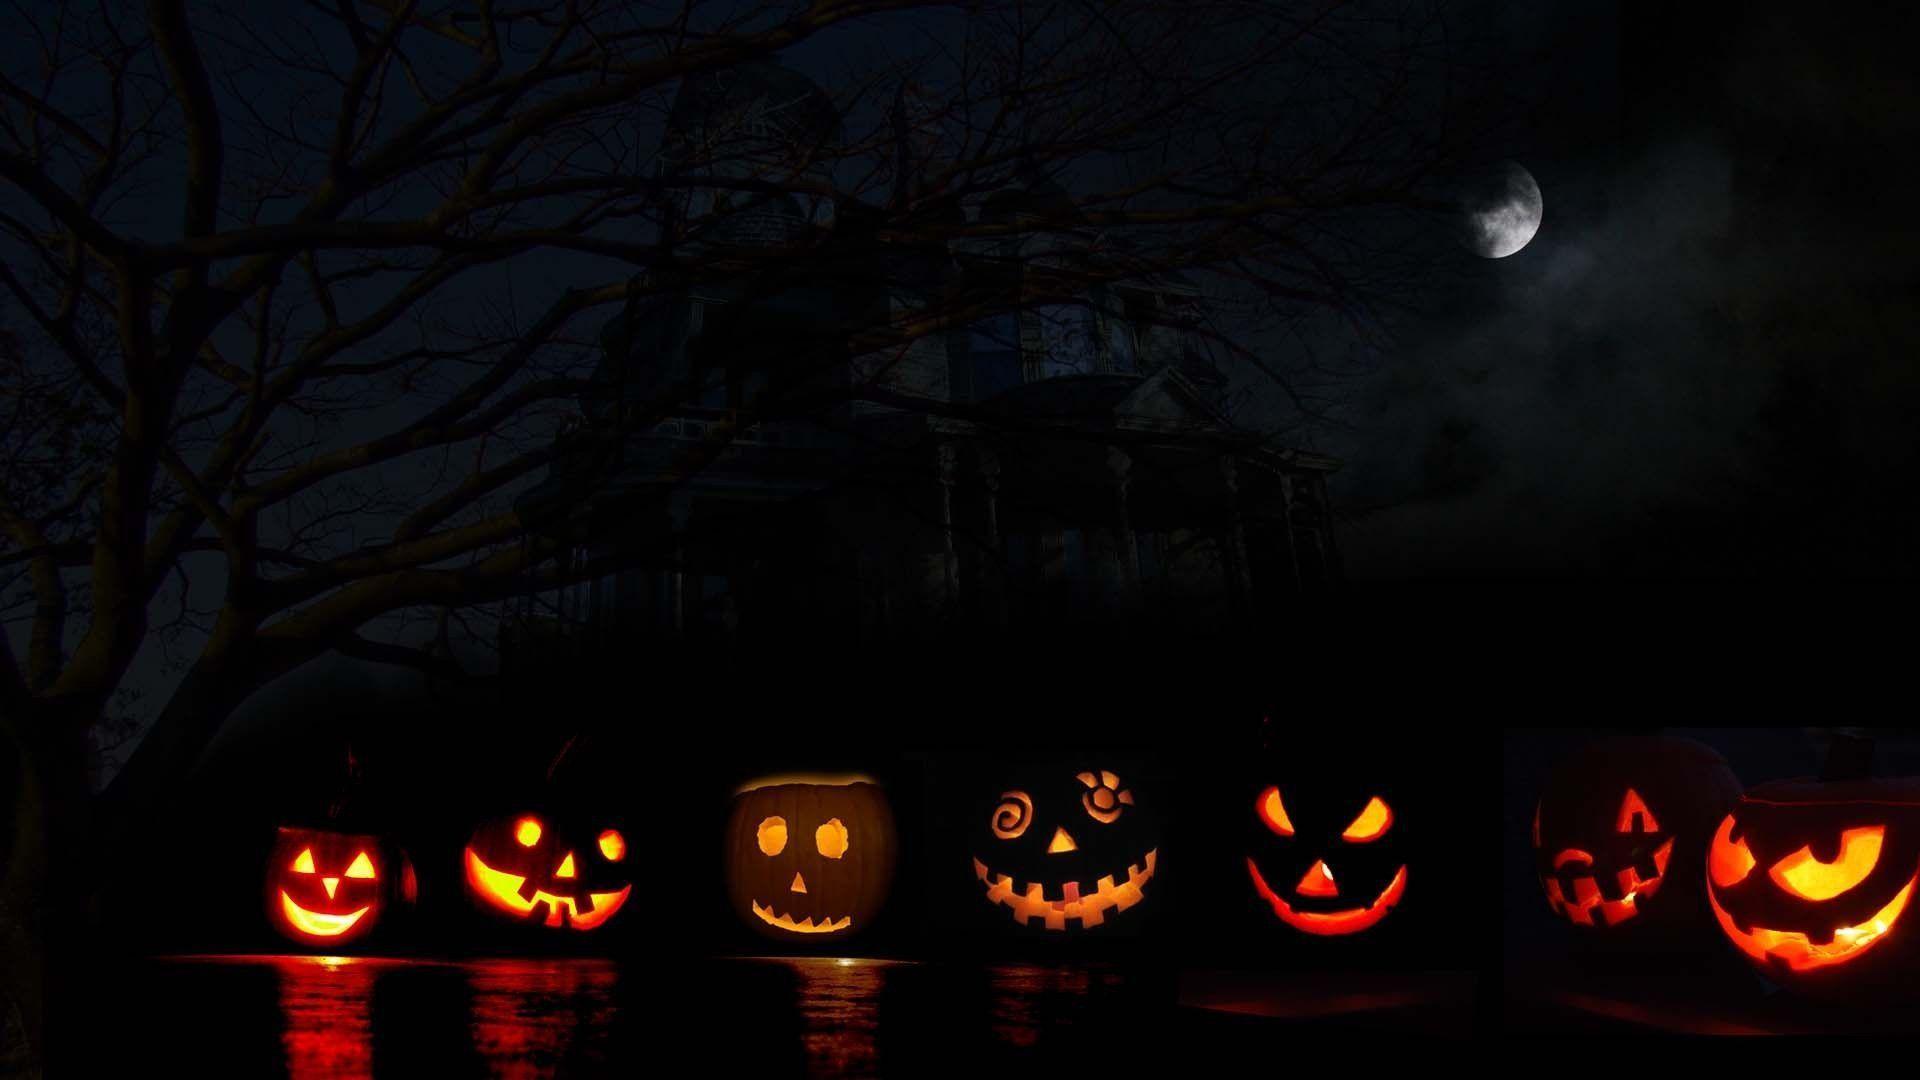 Great Wallpaper Halloween Windows 7 - 914044-free-download-halloween-pc-wallpaper-1920x1080-for-meizu  You Should Have_61971.jpg